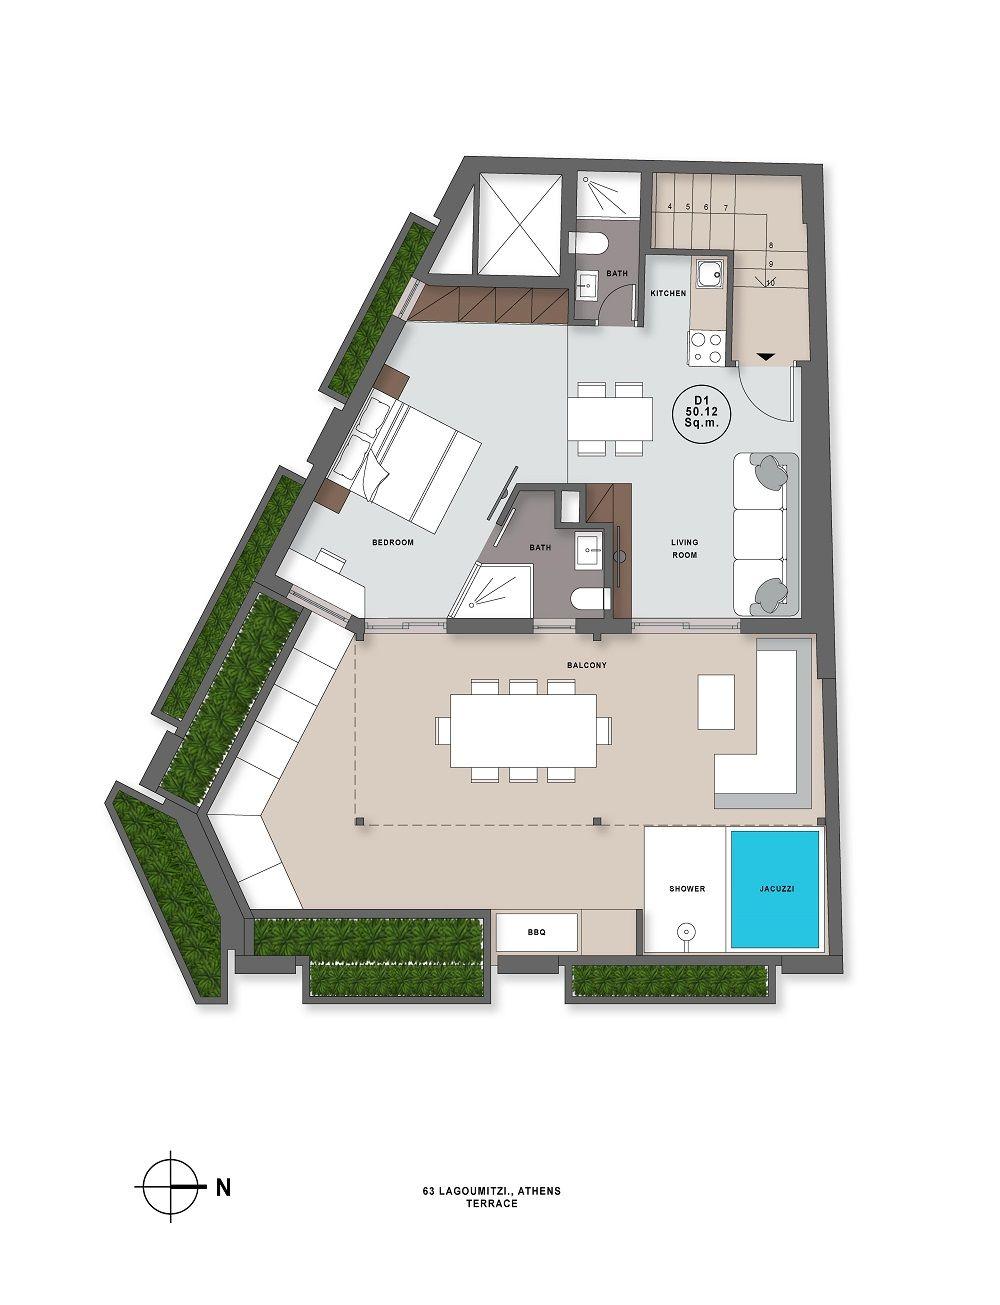 Lagoumitzi 63 terrace plan